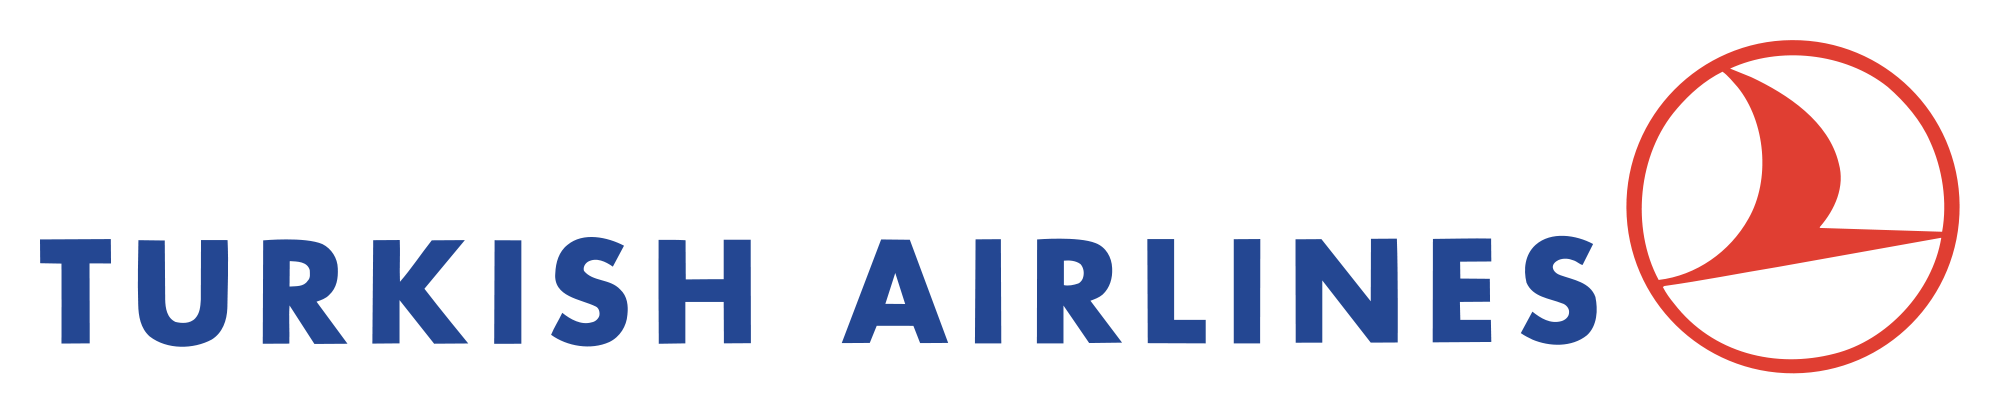 turkish air lines logo png #2538